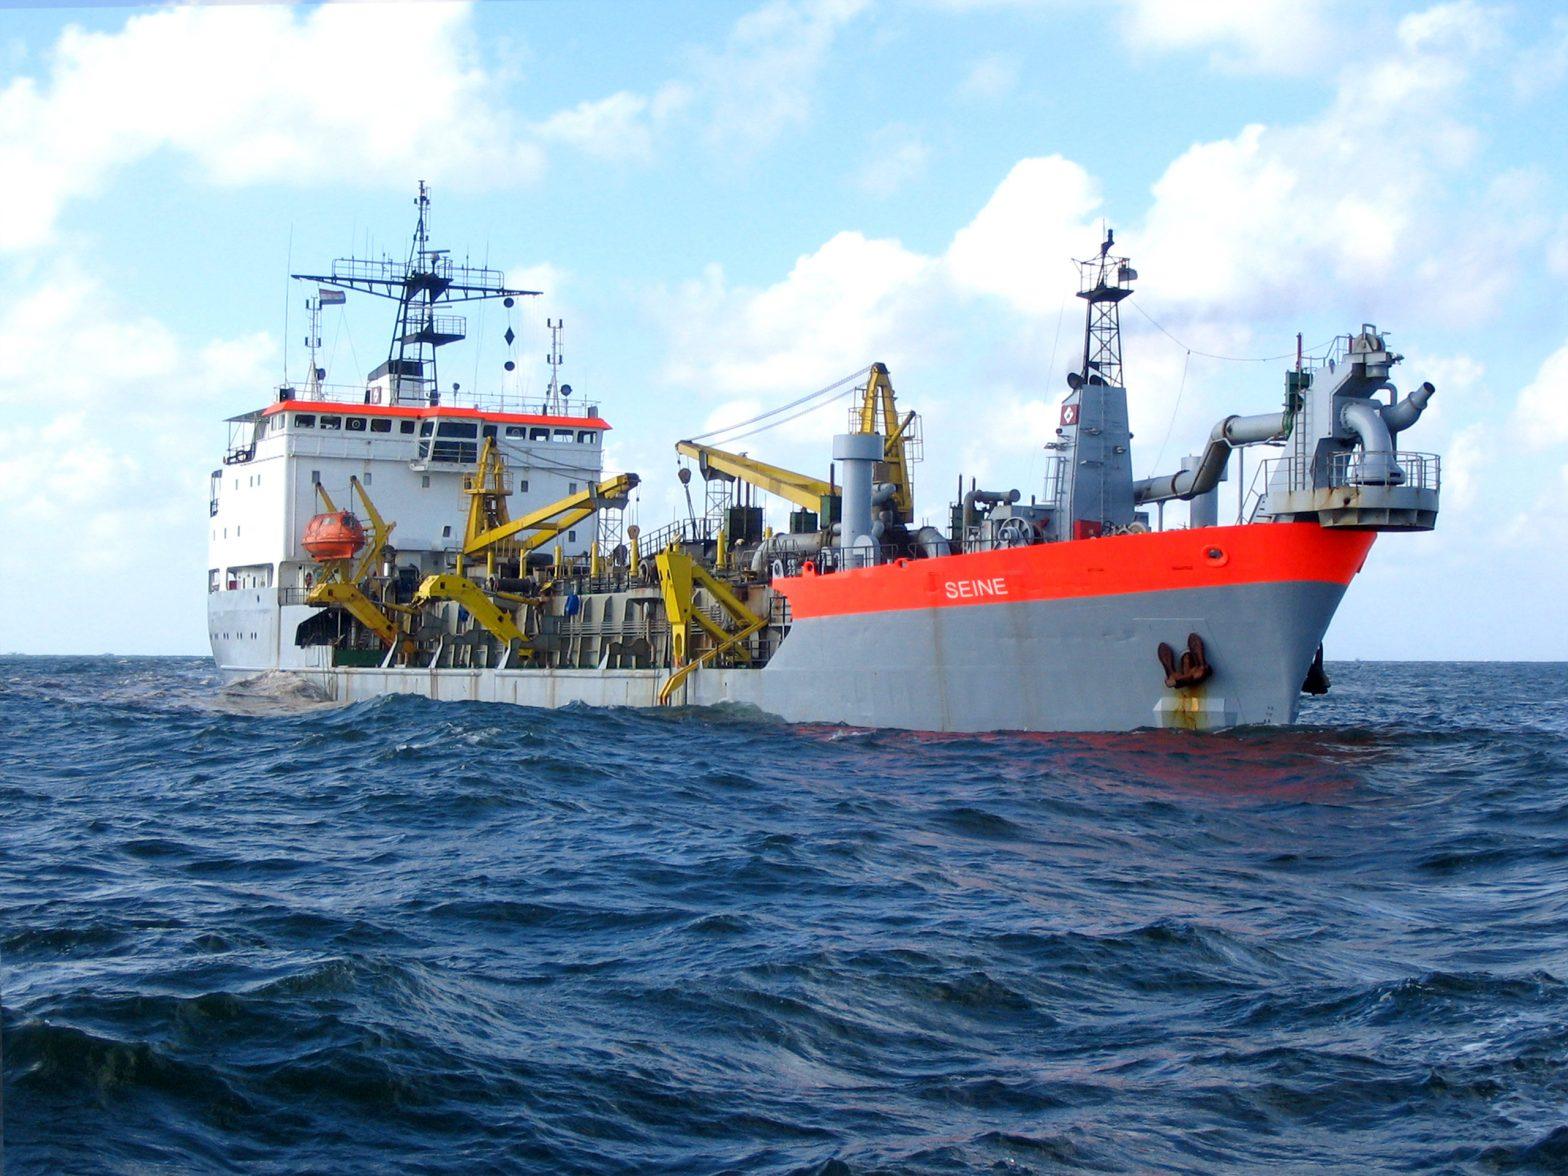 Trailing suction hopper dredgers